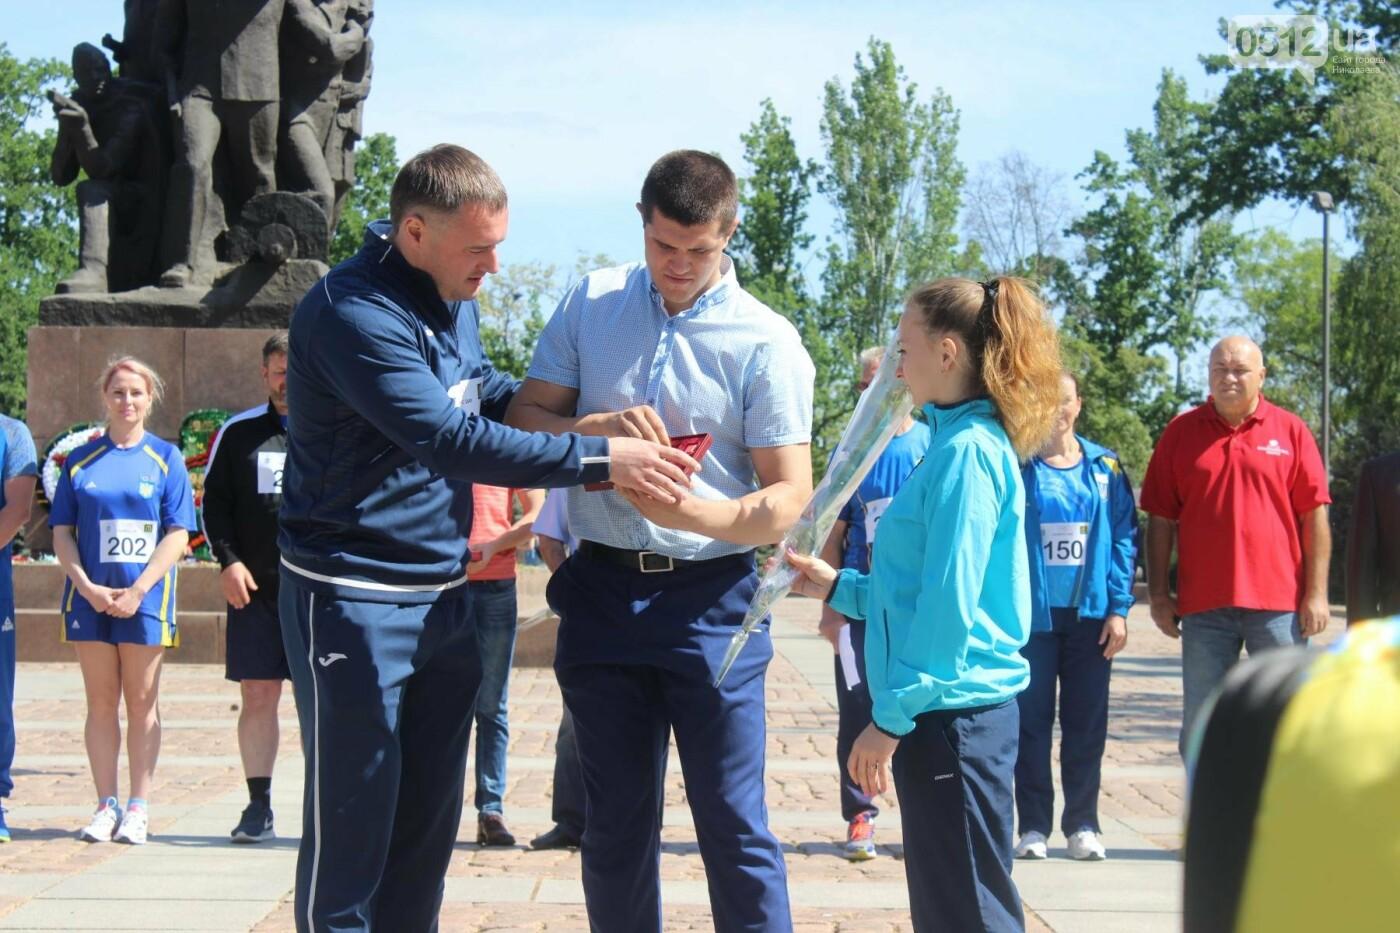 В Николаеве на день олимпийца спортсменам вручили награды и ключи от нового автобуса, - ФОТО , фото-6